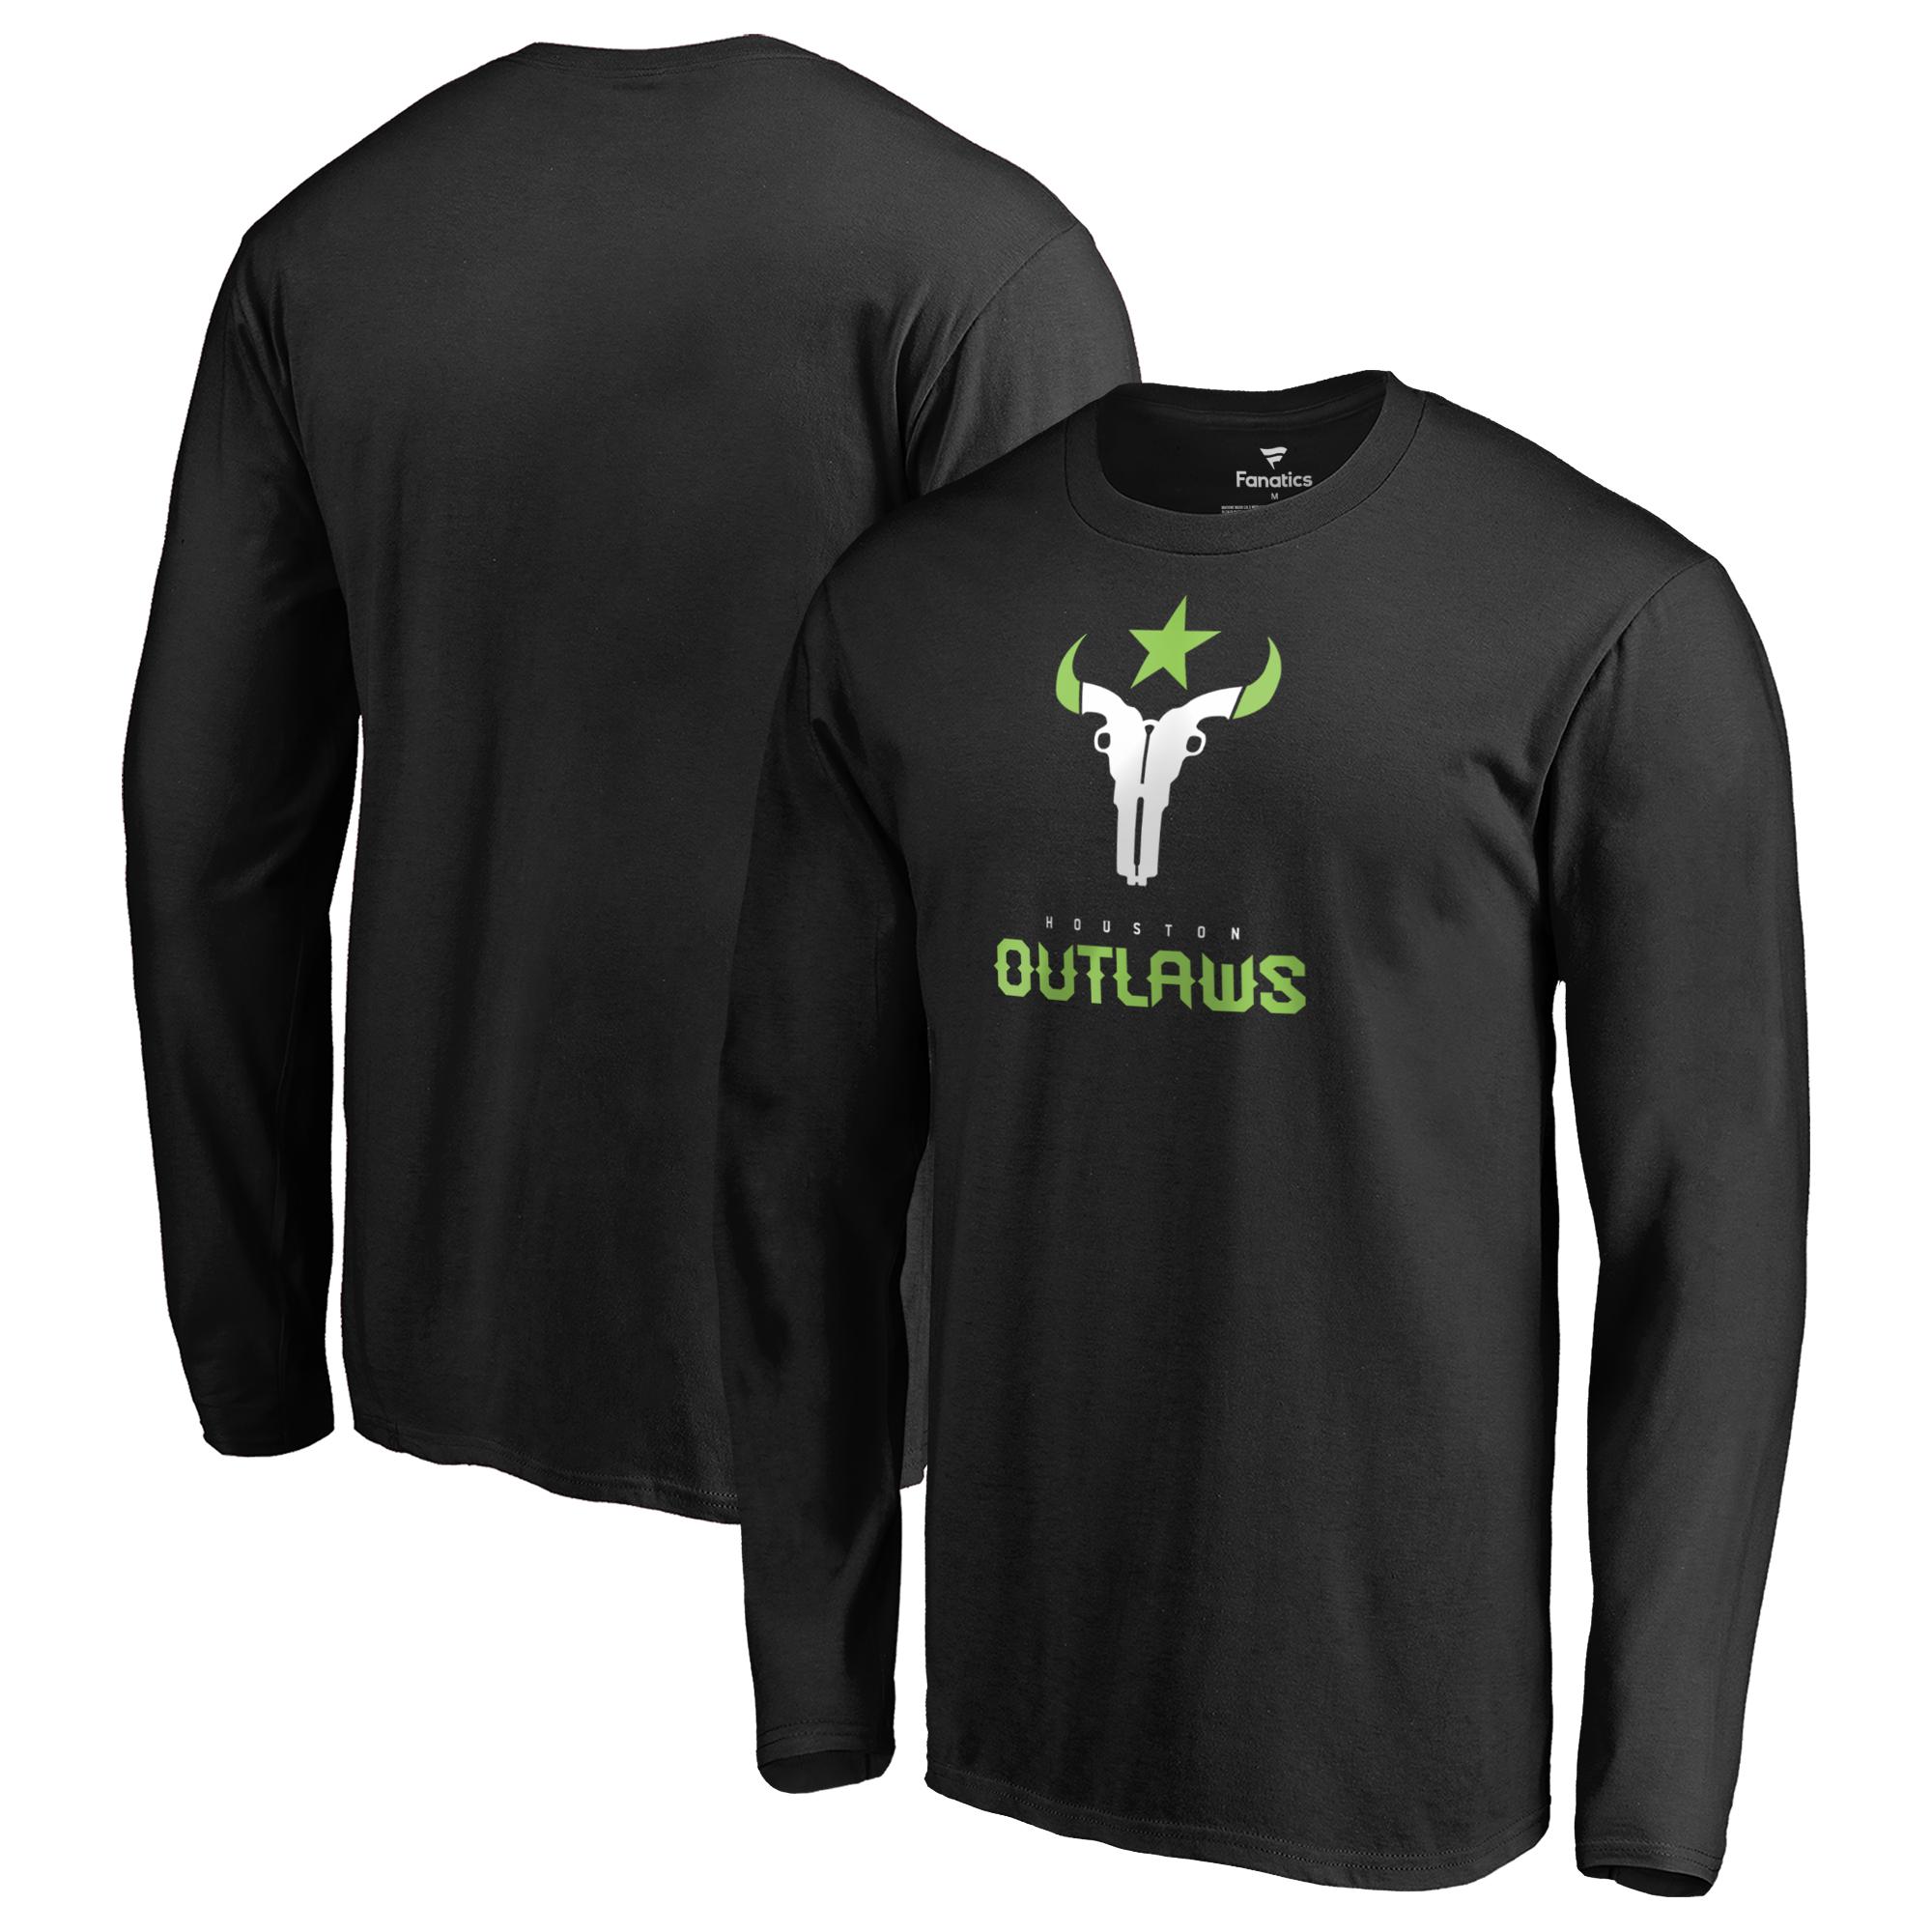 Houston Outlaws Fanatics Branded Team Identity Long Sleeve T-Shirt - Black